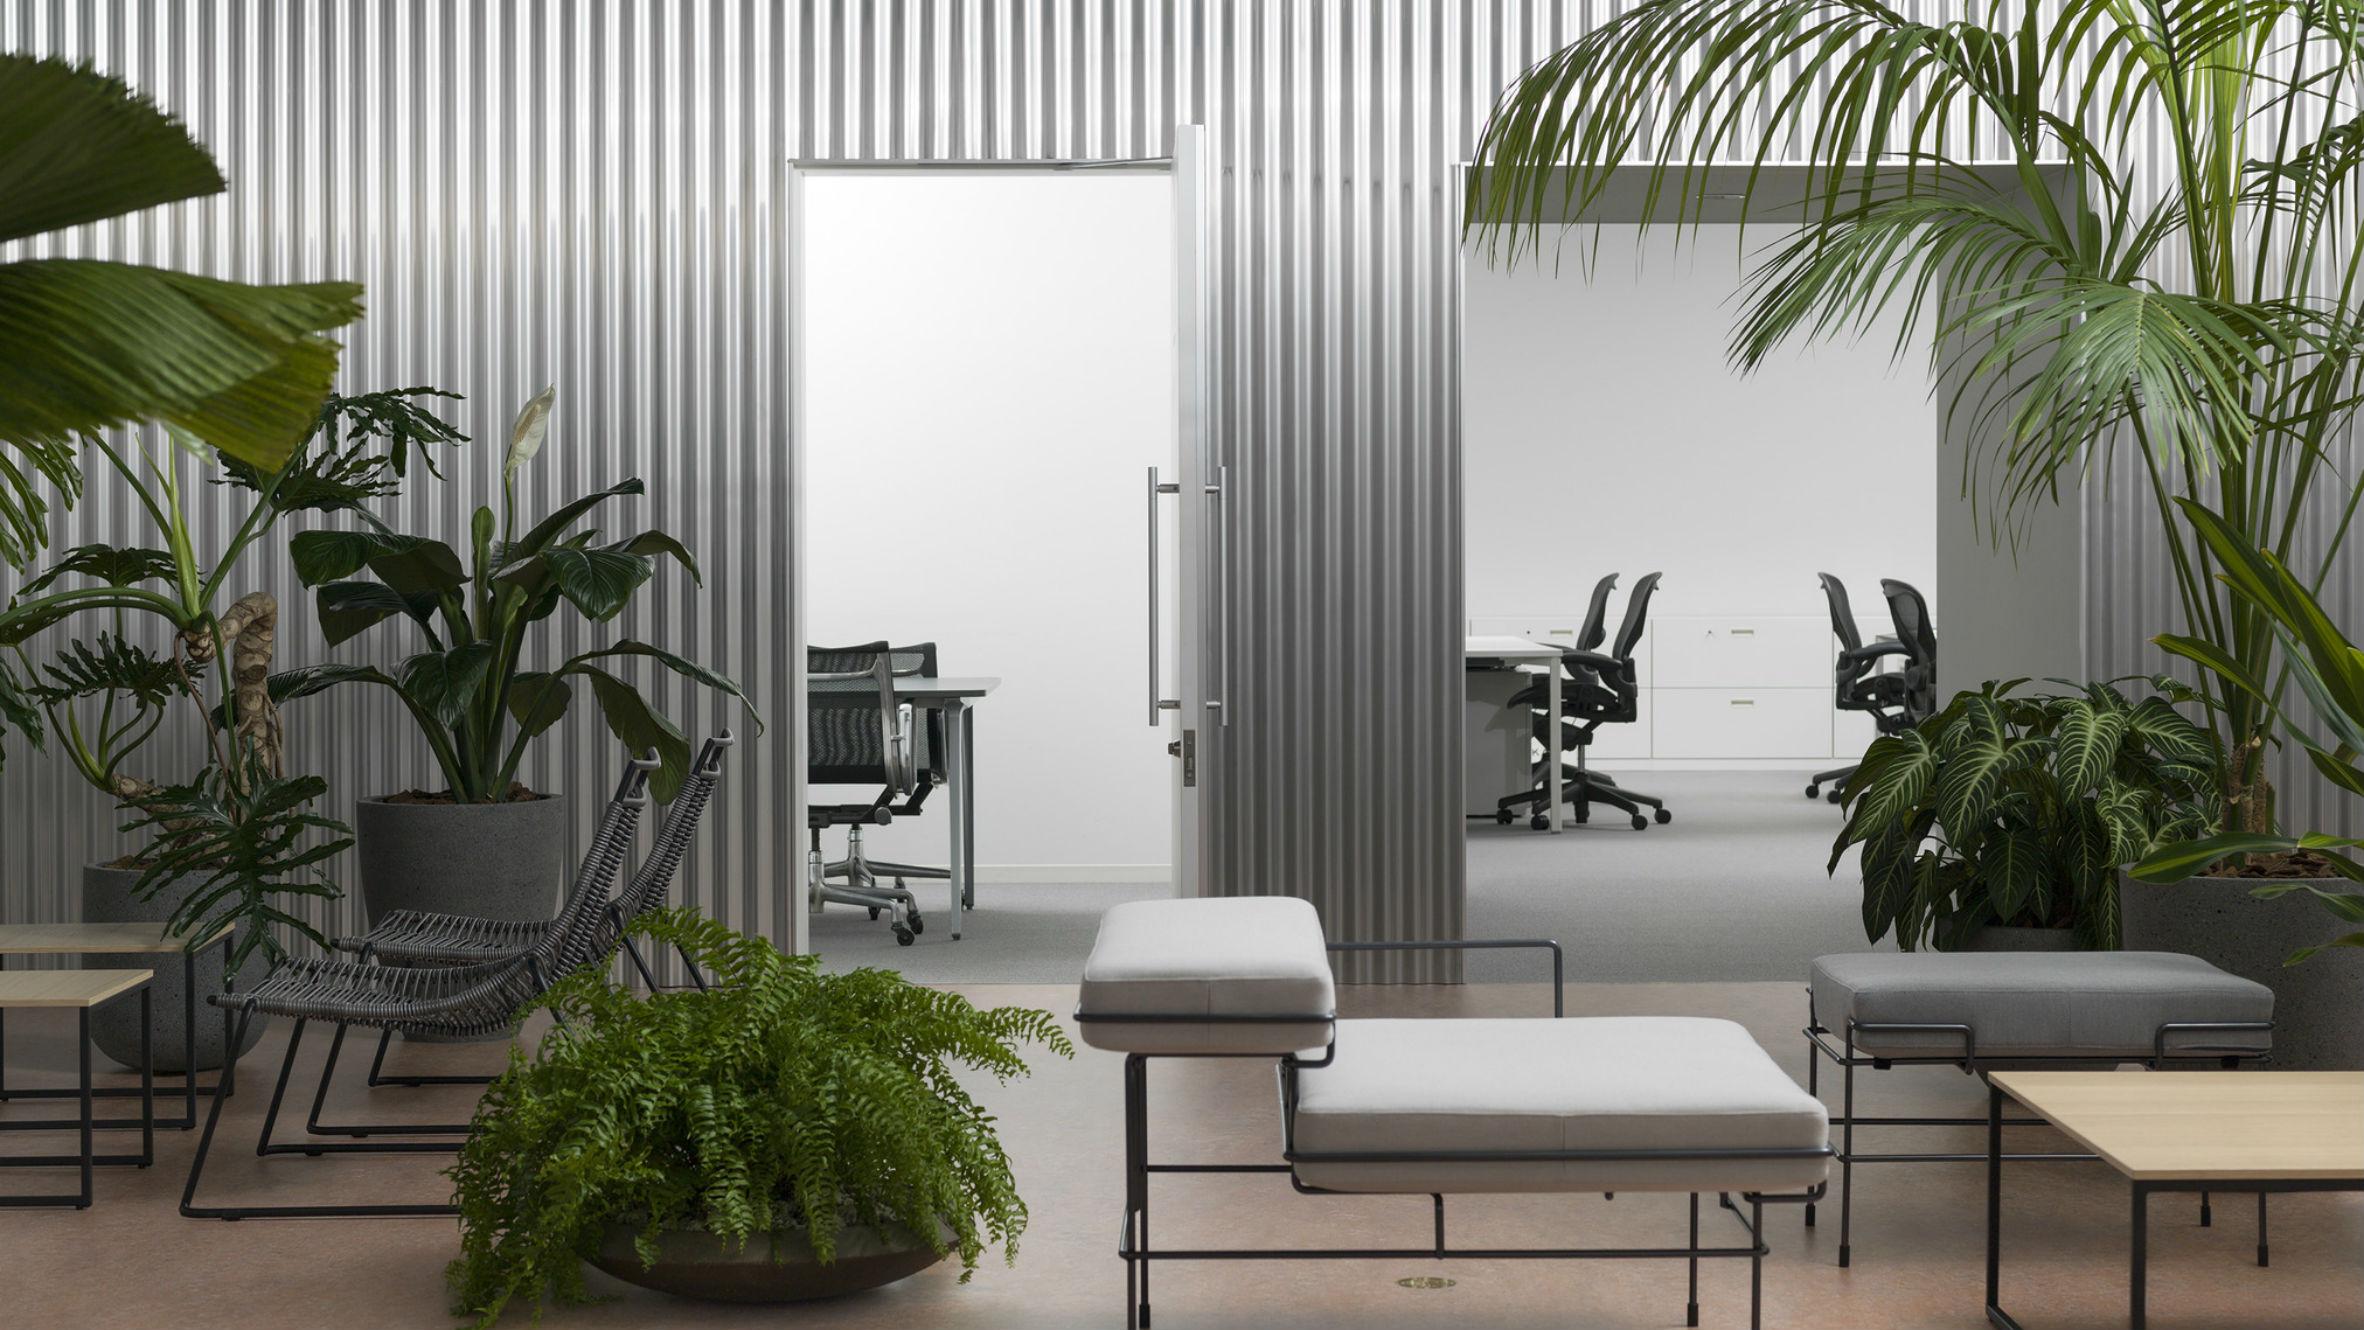 Office With a Patio, Tokyo, Japan, by Shogo Onodera/Tsukasa Okada